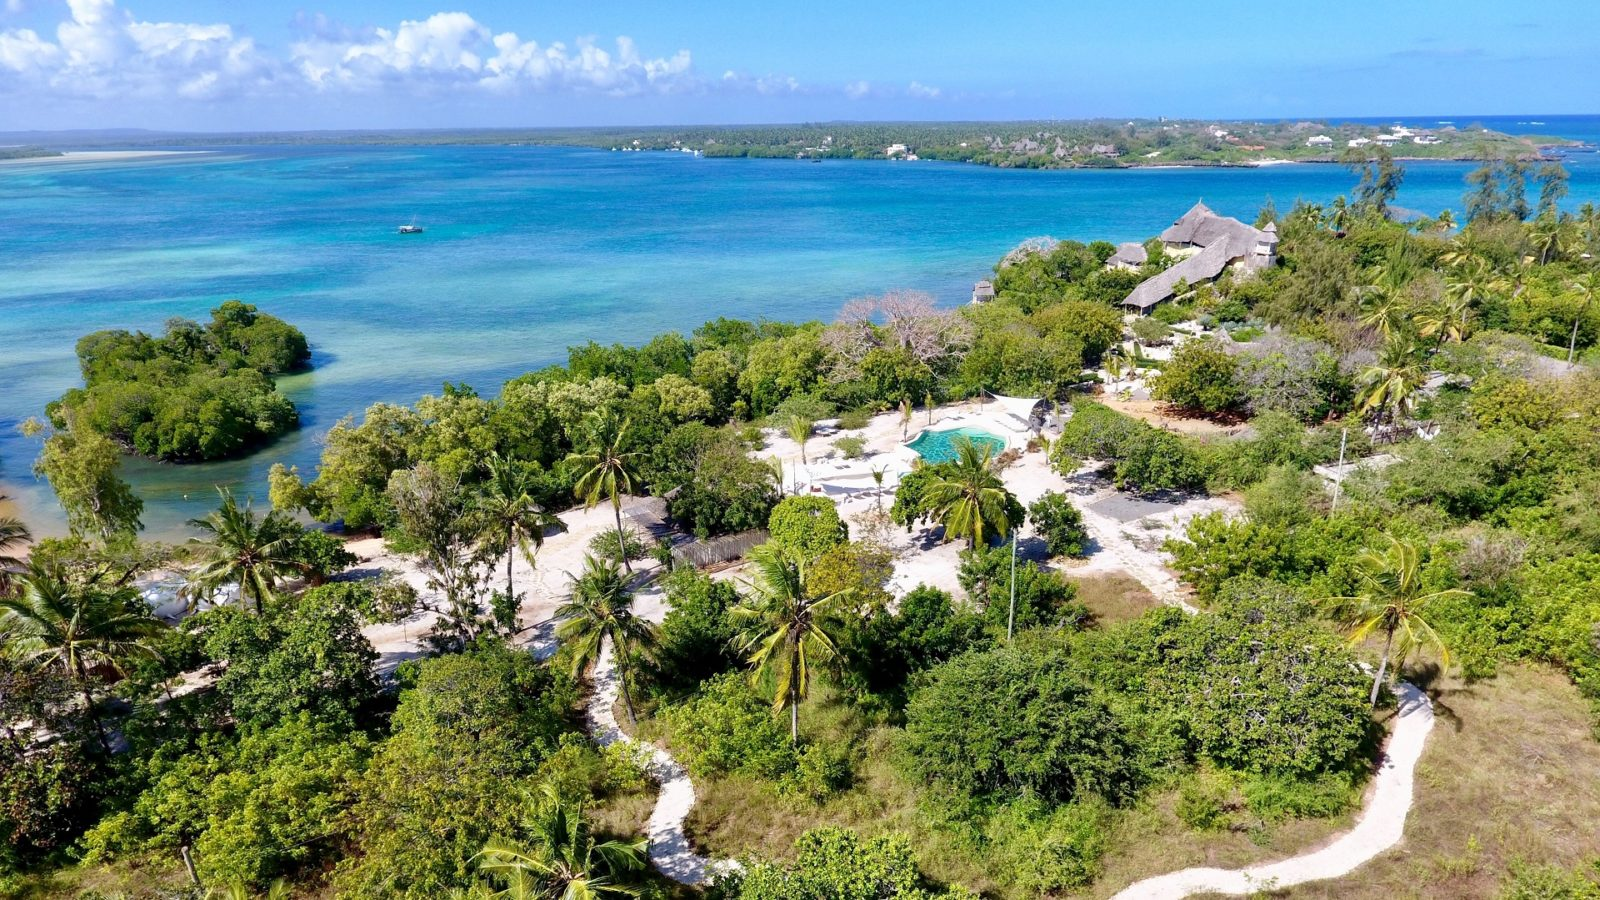 Case Vacanza Kenya 2020 Holiday Homes Watamu Rock n Sea Eco Resort Watamu